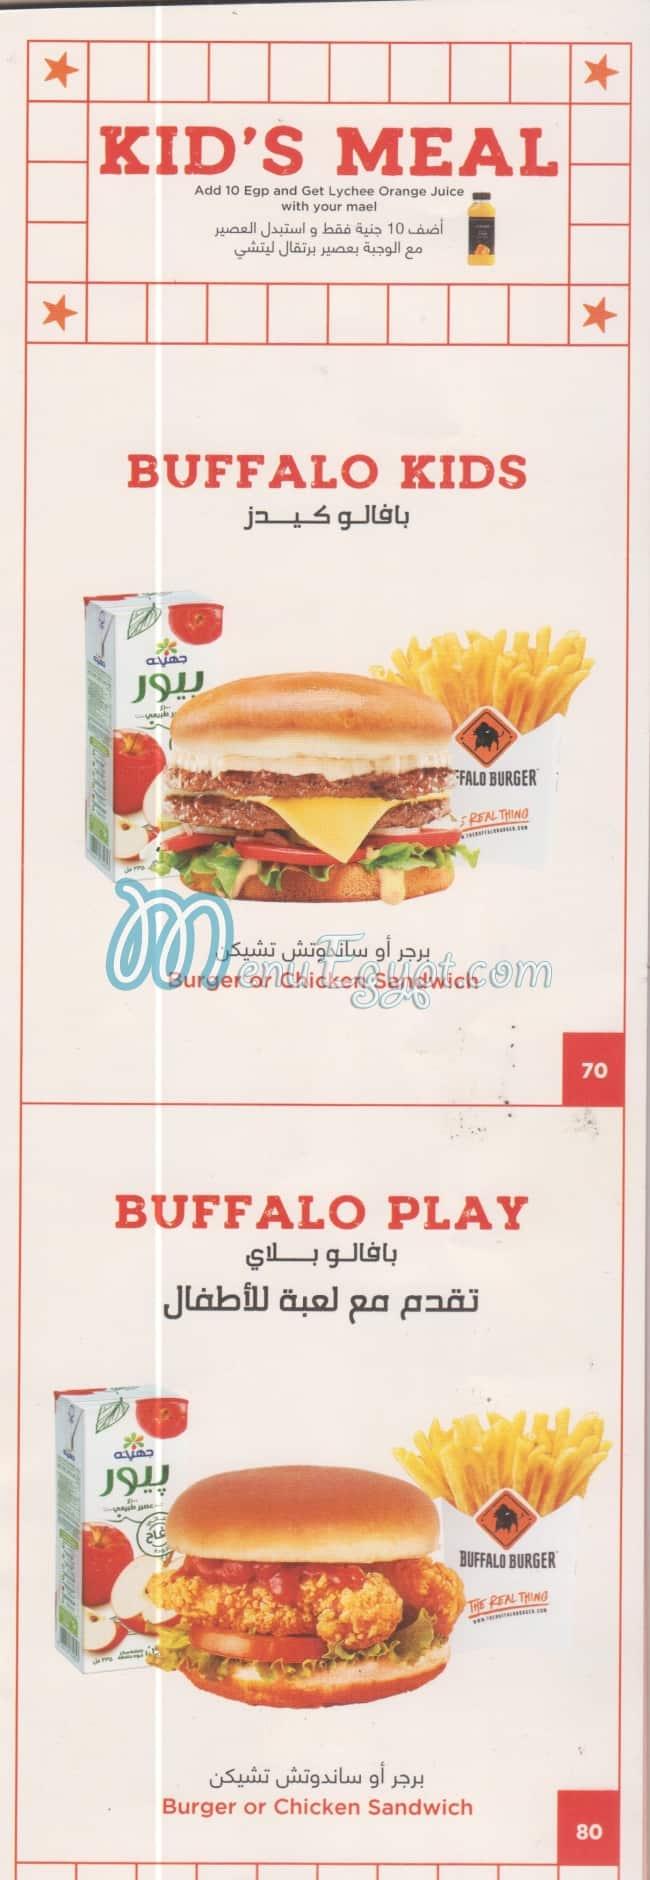 Buffalo Burger delivery menu